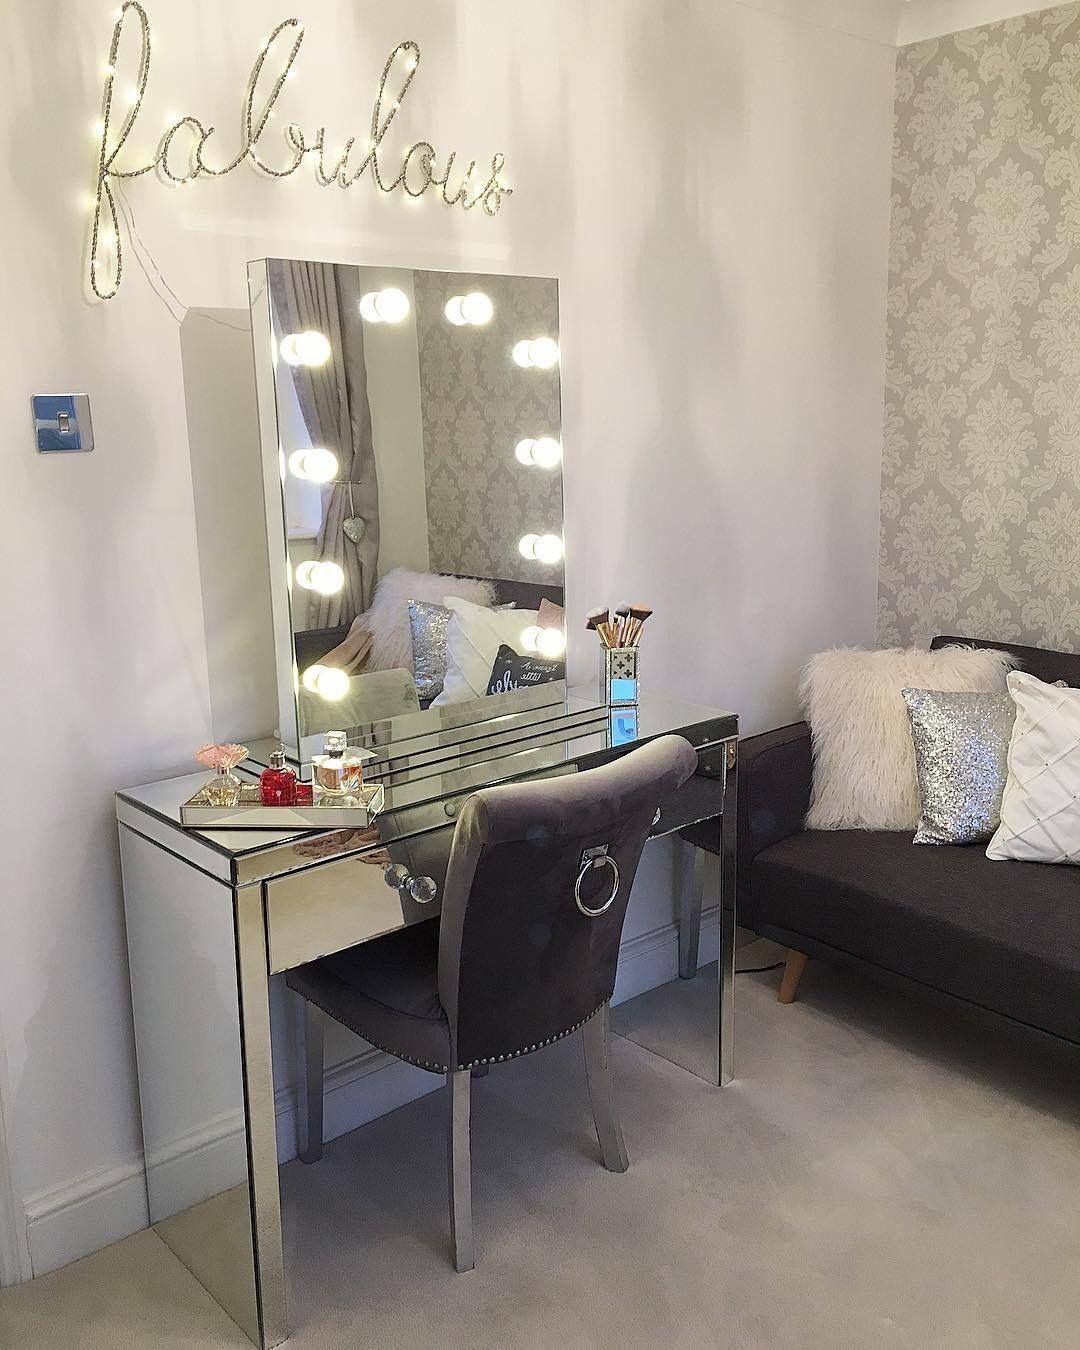 pinterest nandeezy † Home decor, Dream decor, Room